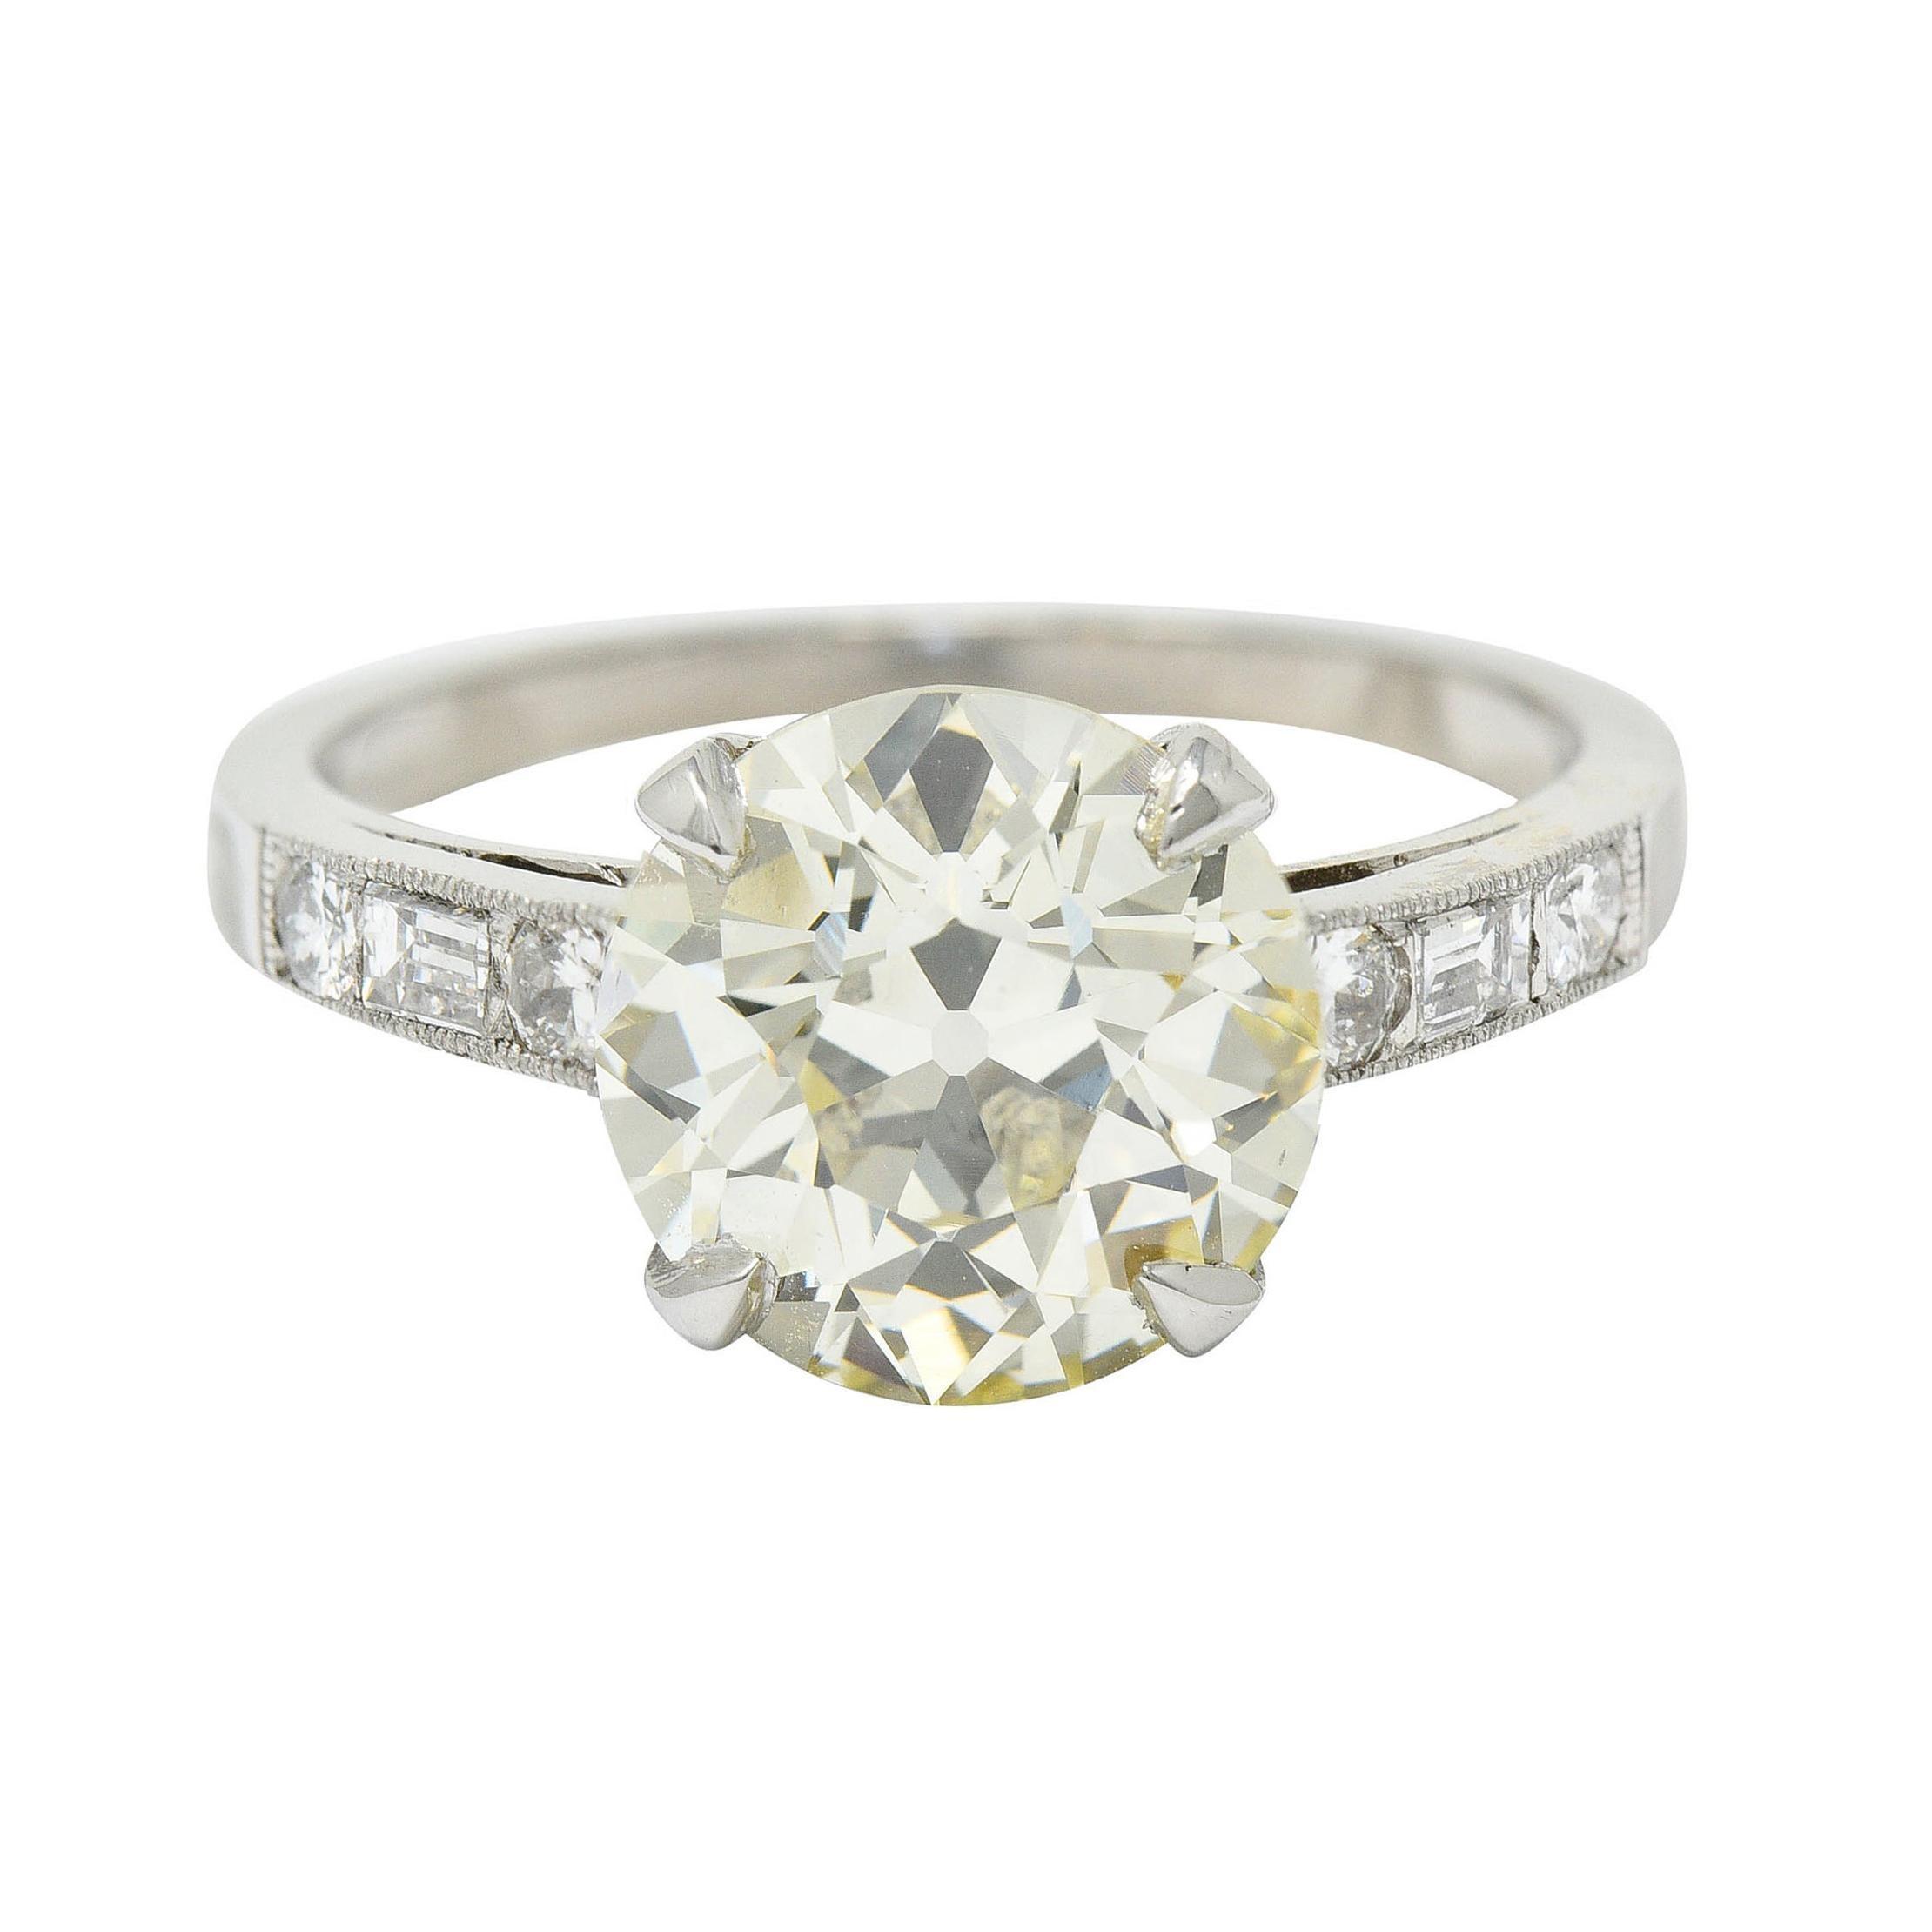 Art Deco 3.20 Carats Old European Diamond Platinum Engagement Ring GIA, 1930's